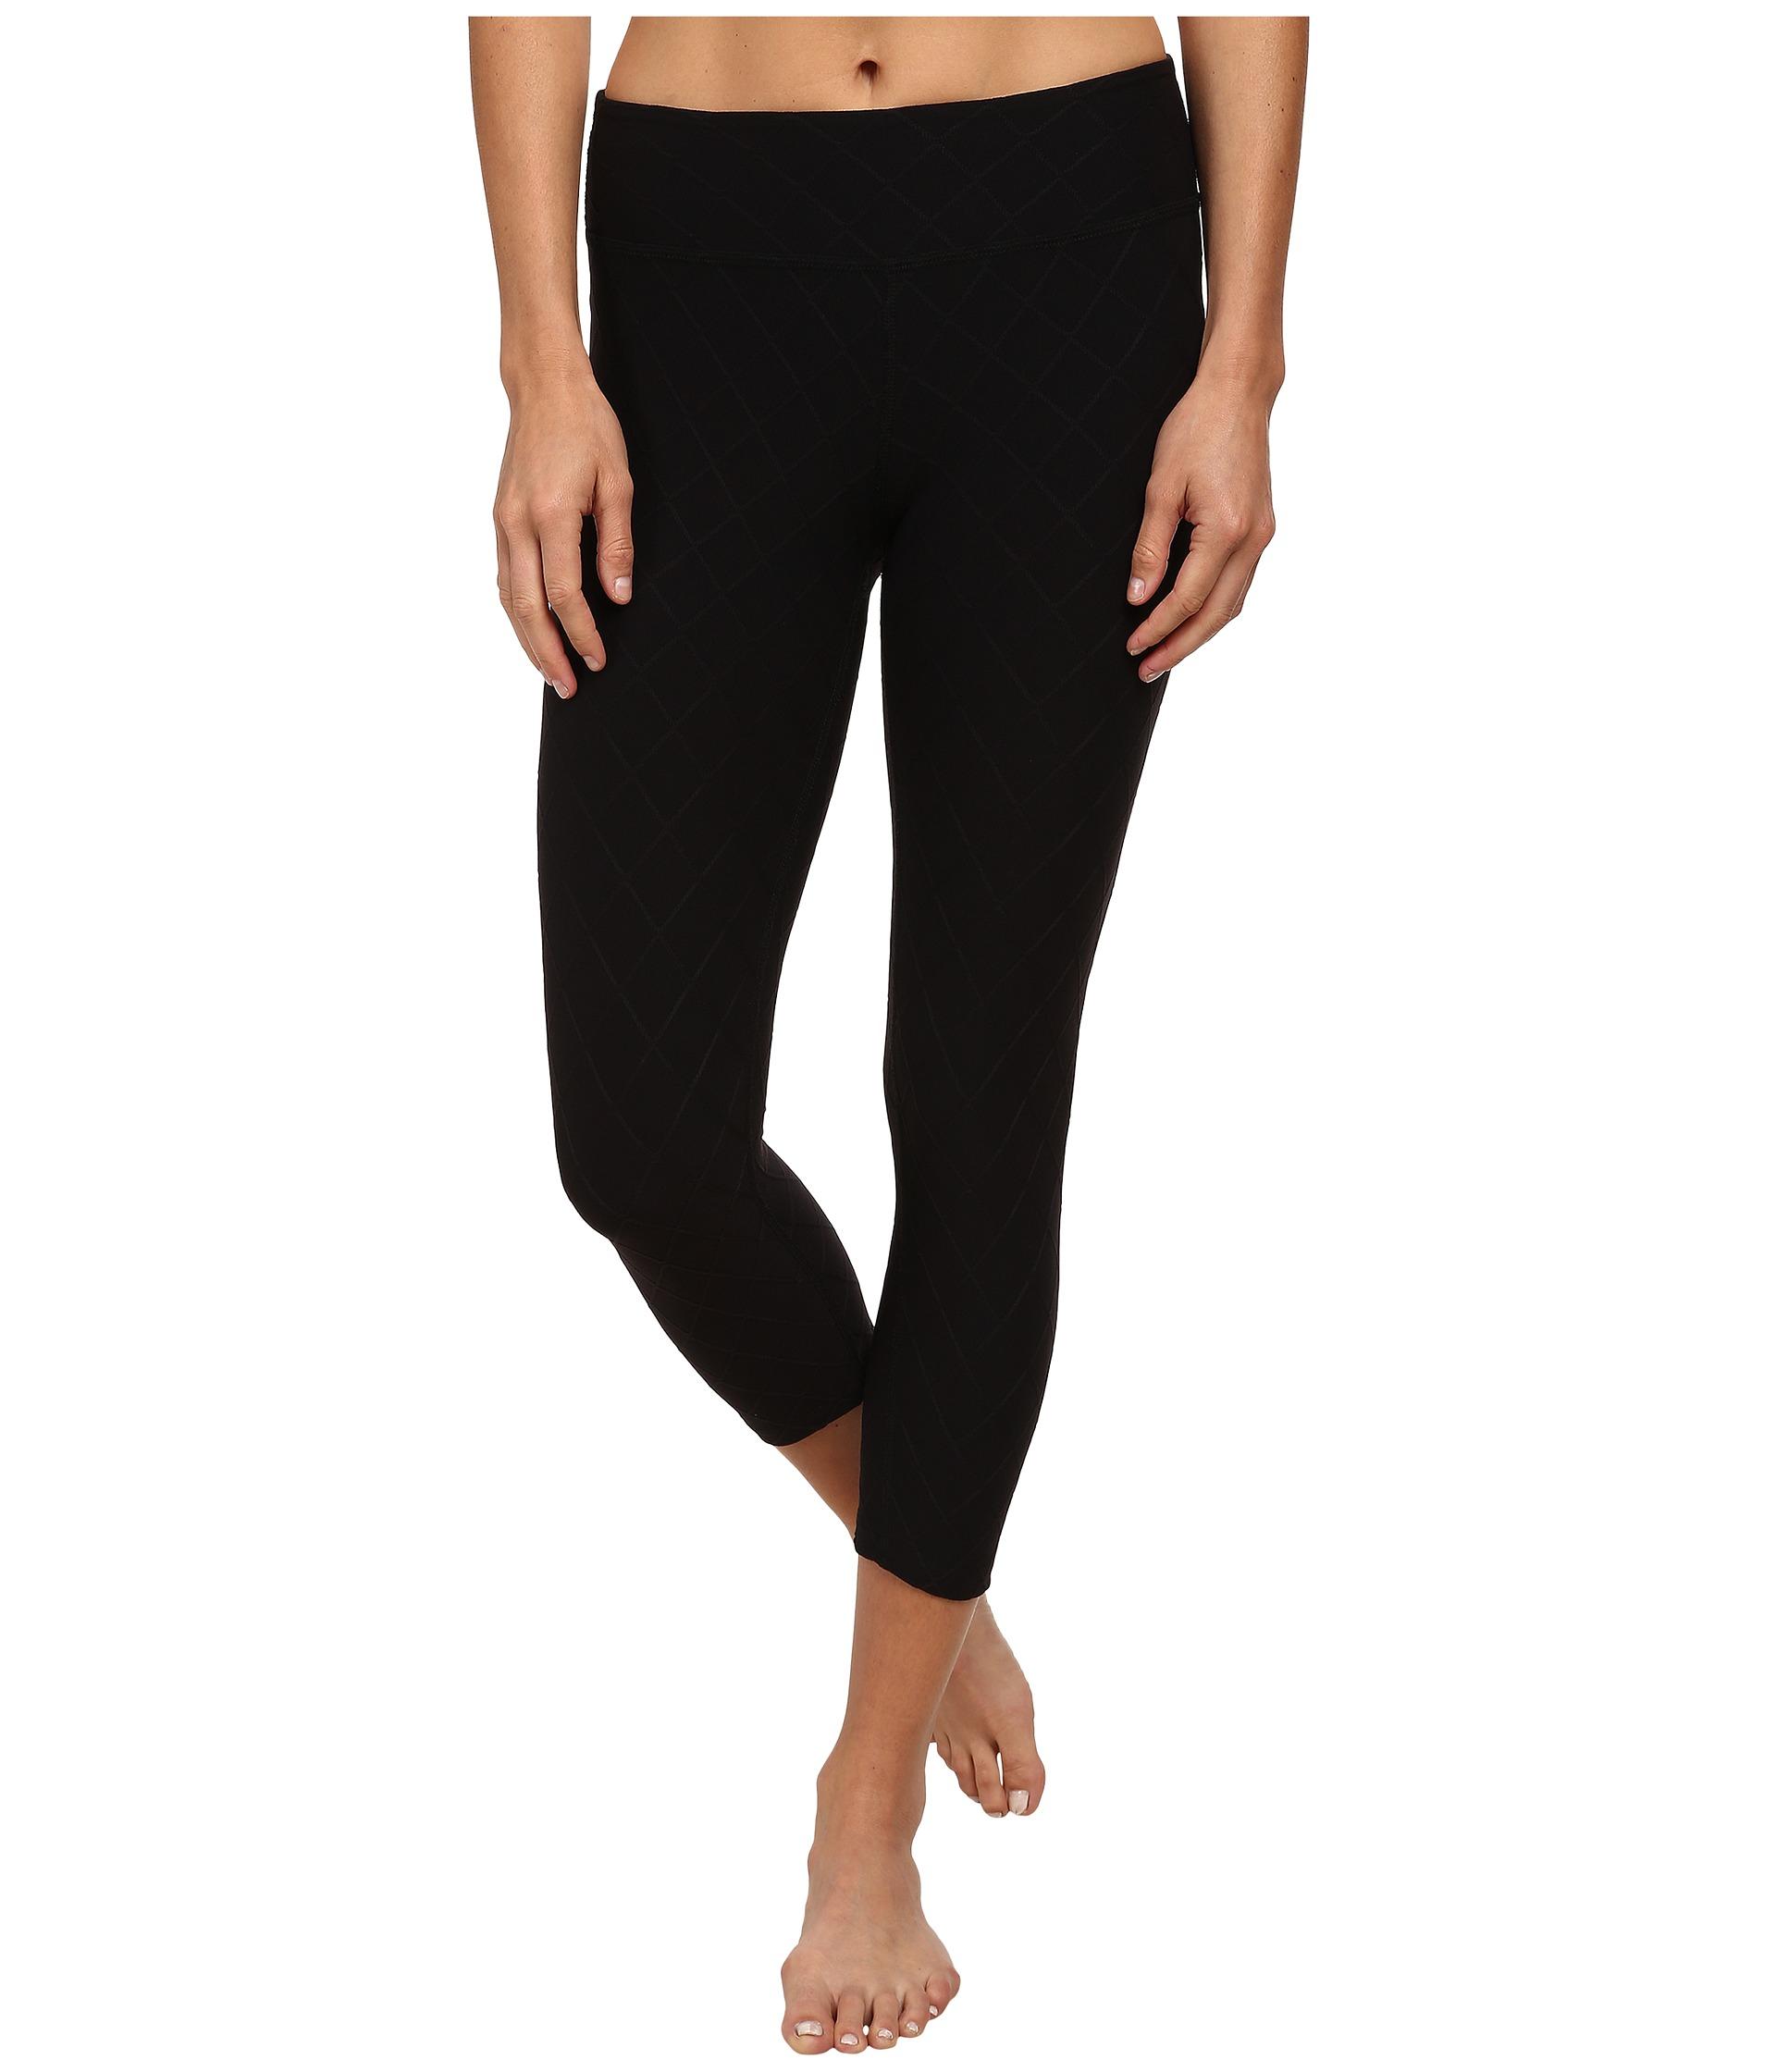 9d19f7f035e2b Beyond Yoga Quilted Capri Legging in Black - Lyst